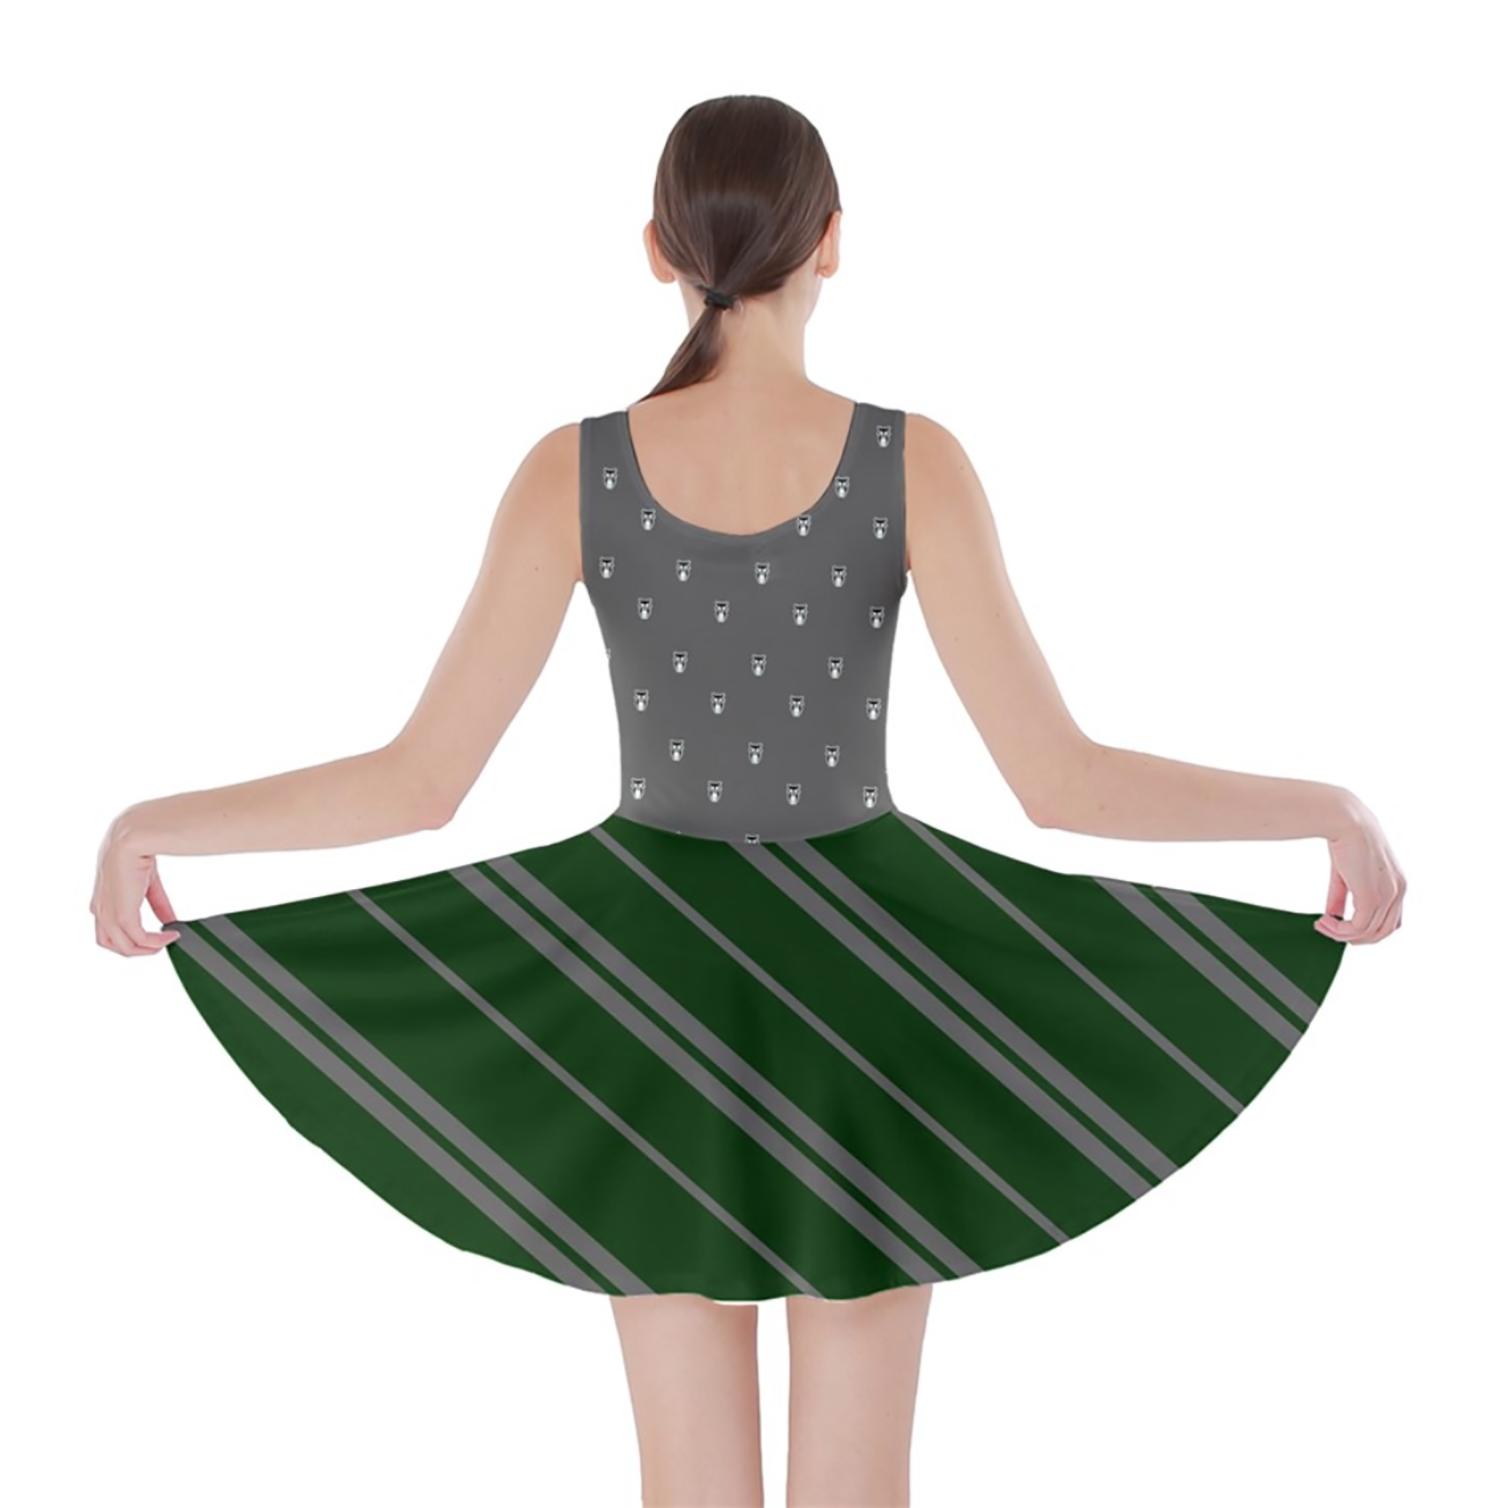 Owl (Green) Striped Skater Dress - Inspired by Slytherin